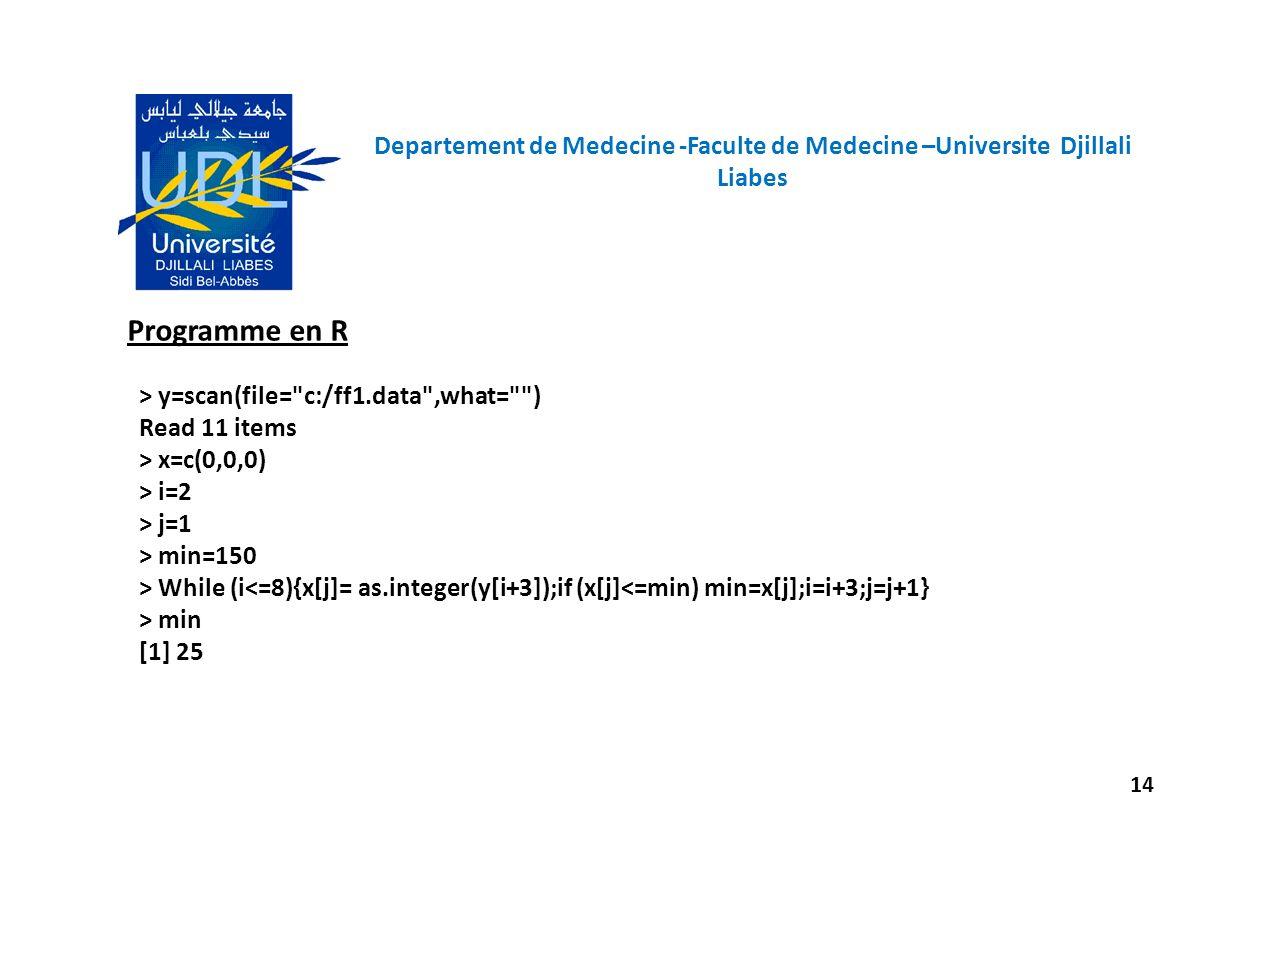 Departement de Medecine -Faculte de Medecine –Universite Djillali Liabes 14 Programme en R > y=scan(file=